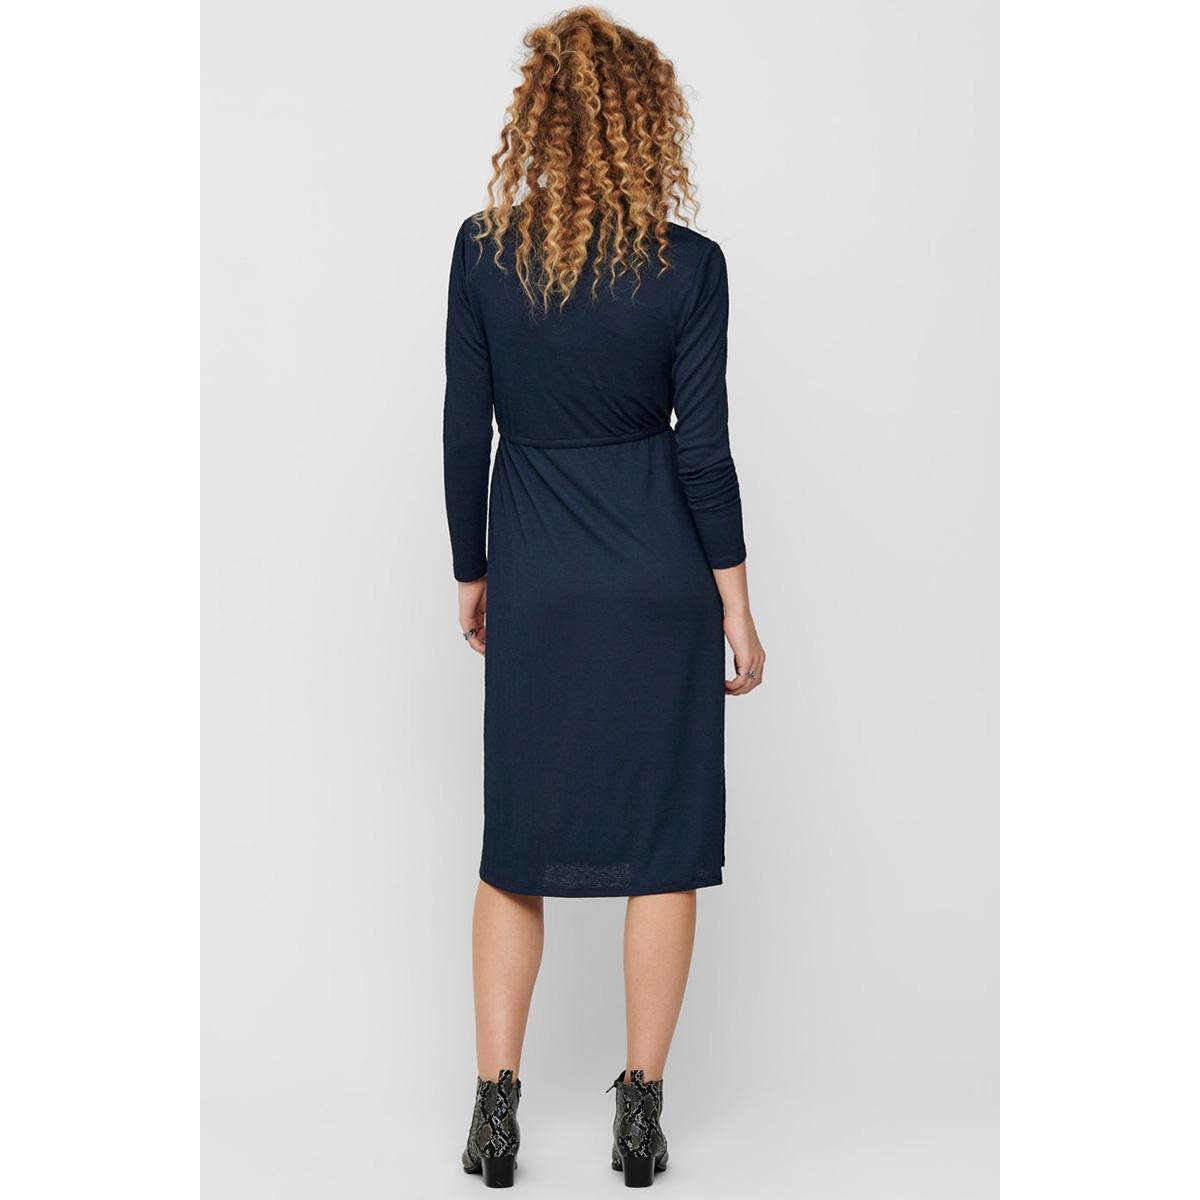 jdyannika l/s dress jrs 15198280 jacqueline de yong jurk dark navy